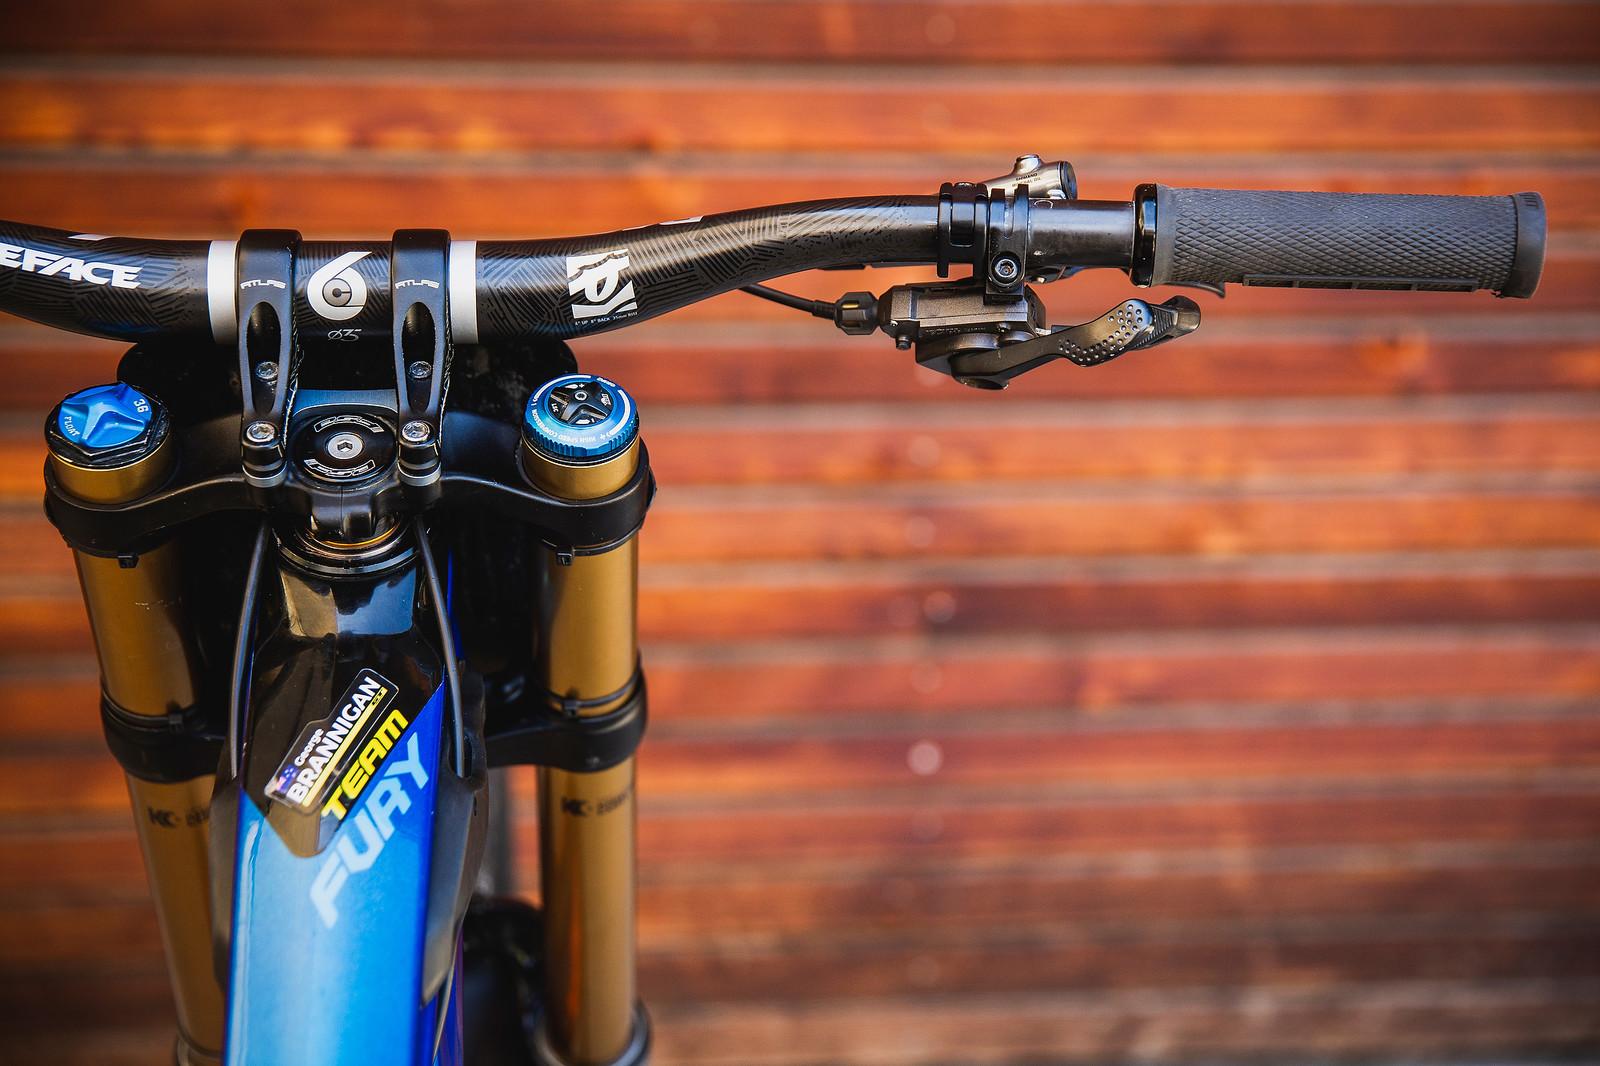 Race Face Cockpit - Pro Bike Check - George Brannigan's GT Fury - Mountain Biking Pictures - Vital MTB